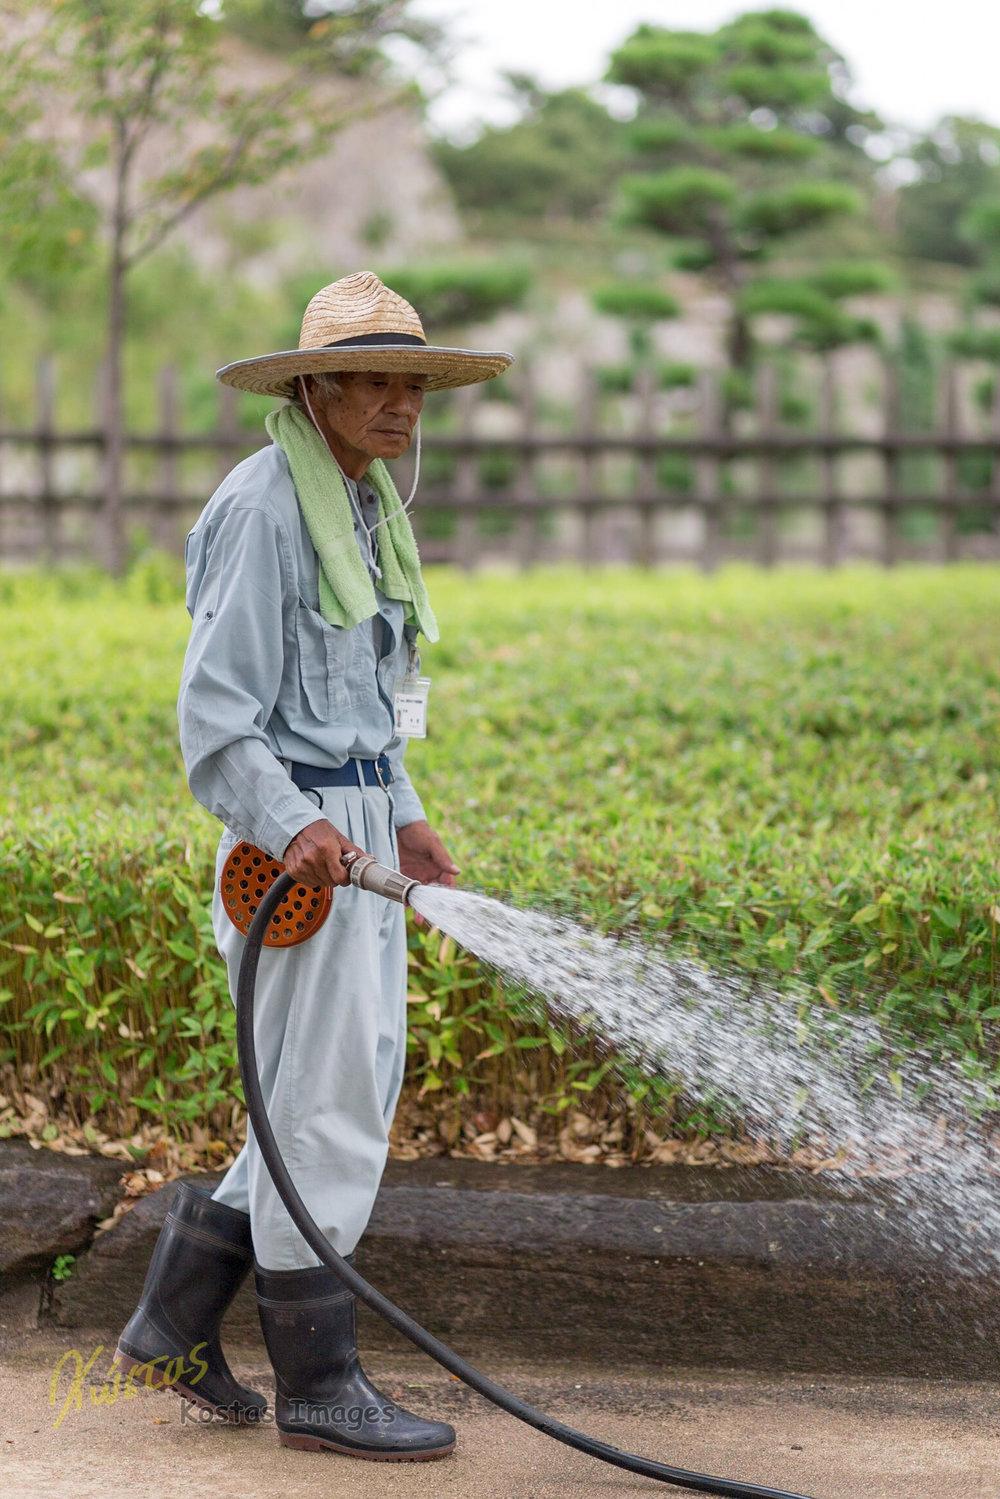 20160826-IMG_3966-Gardener at Himeji.jpg